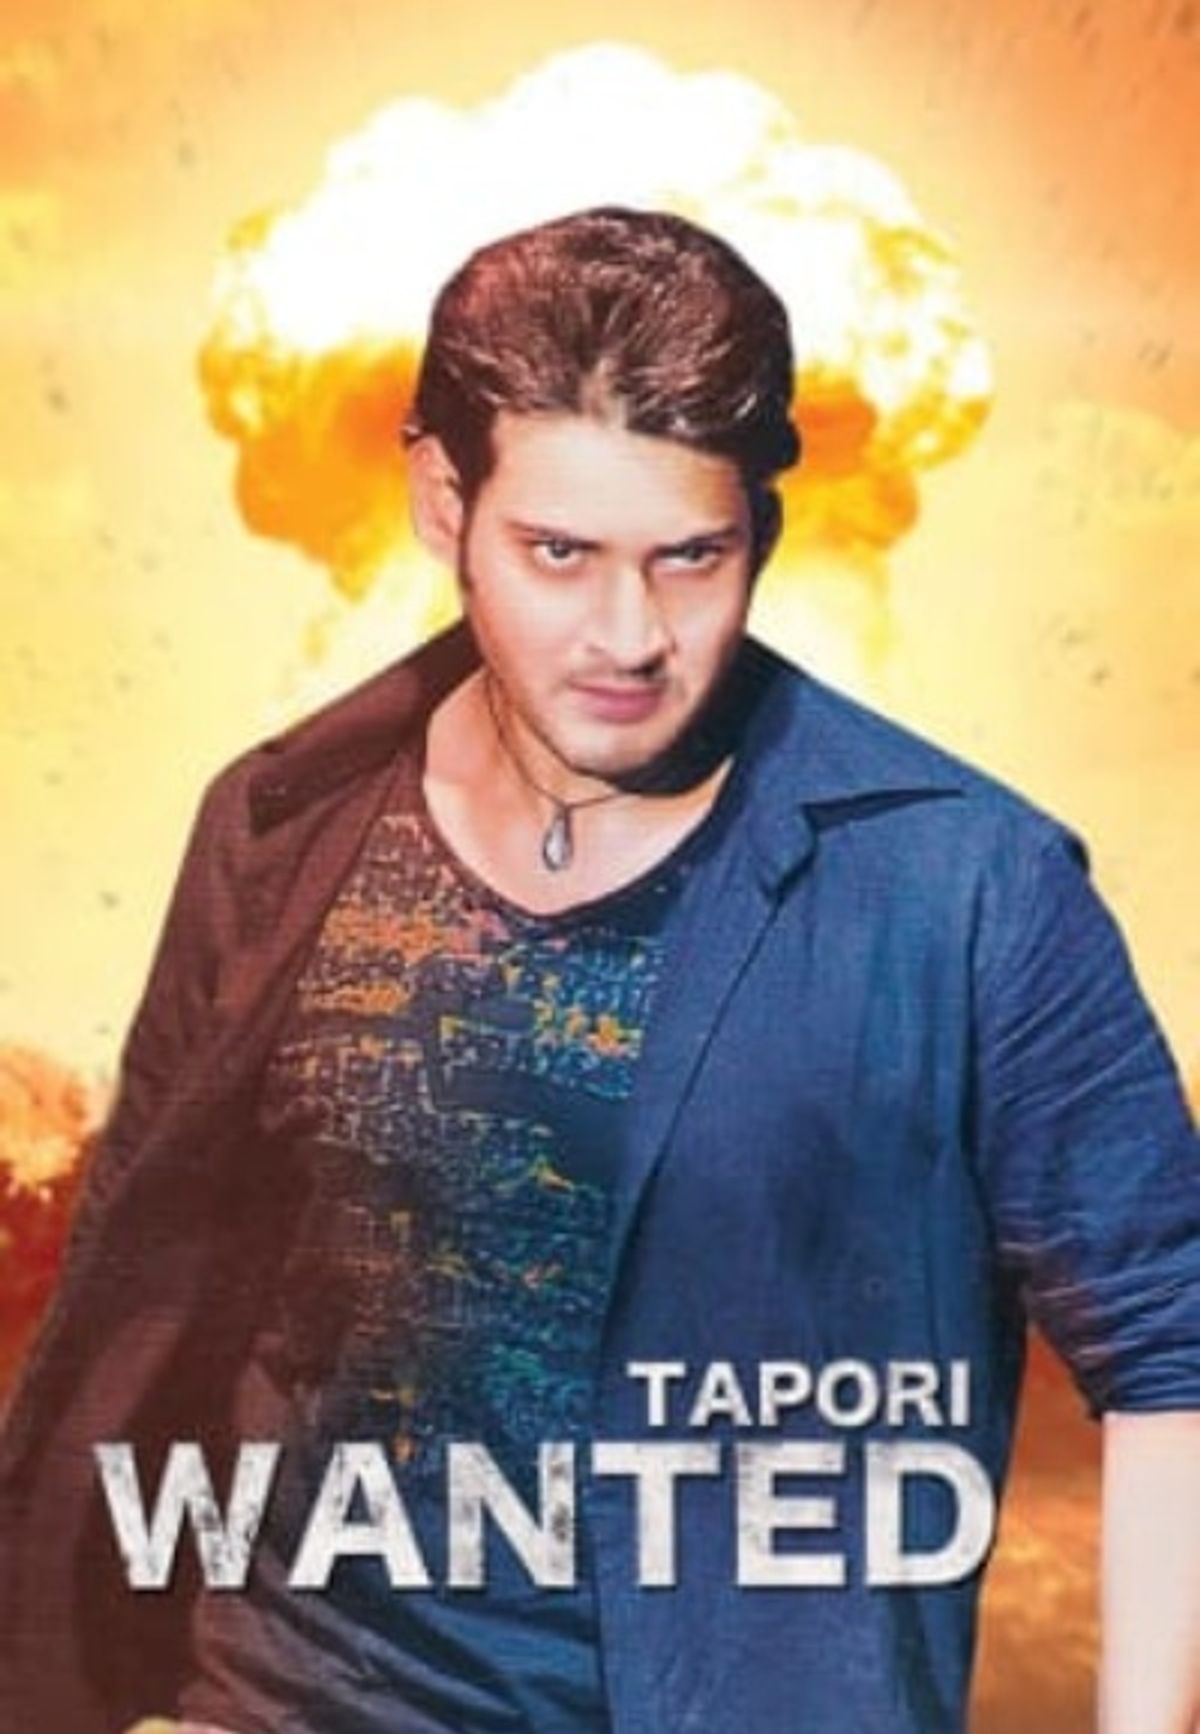 Tapori Wanted